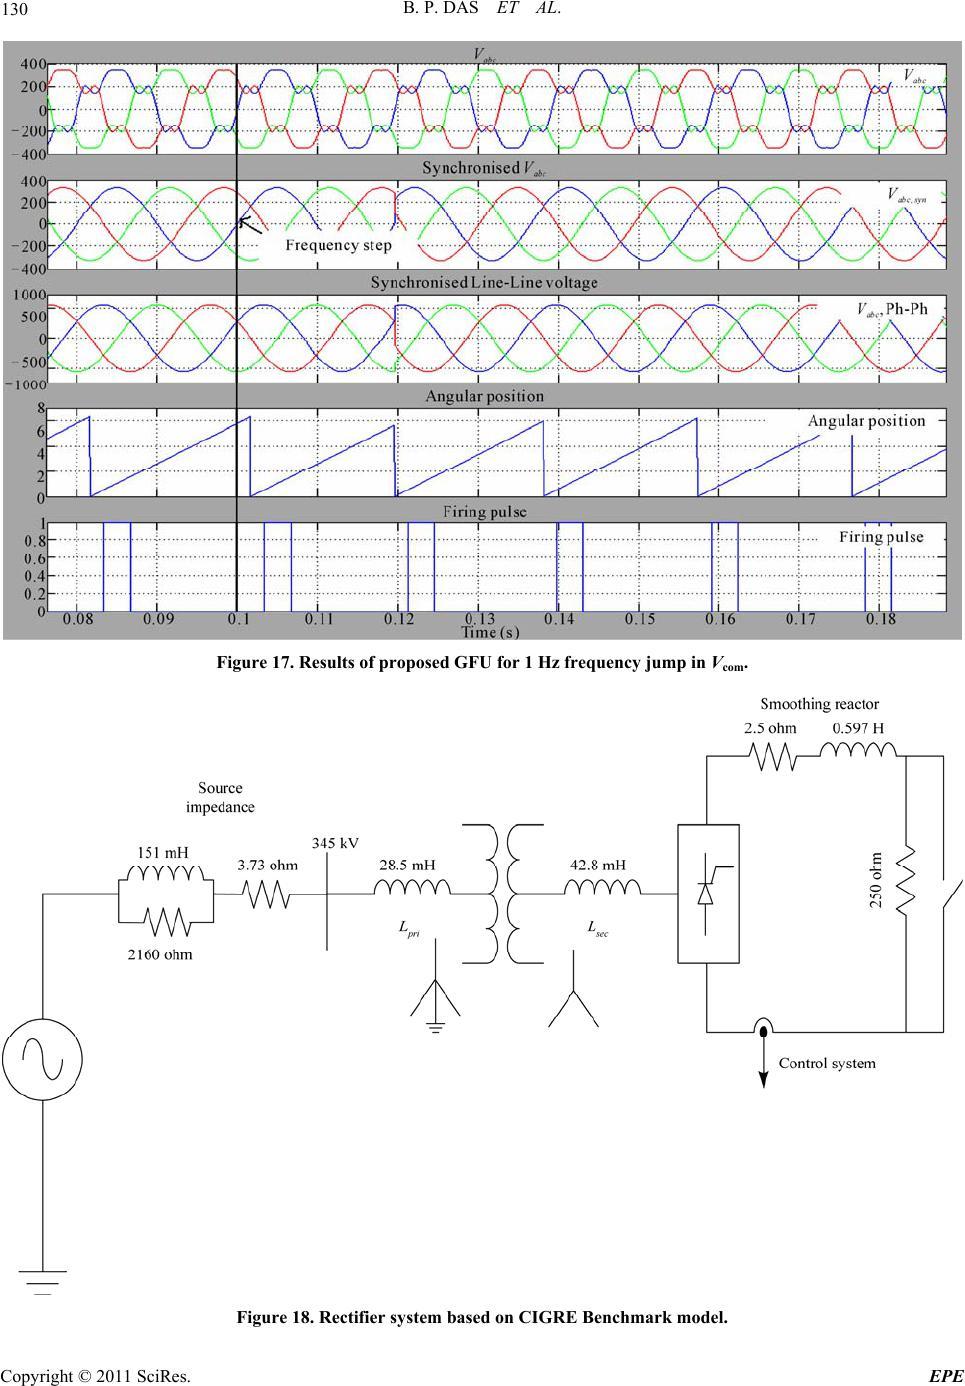 power analysis of hvdc cigre benchmark Modelado a detalle del sistema de transmisión benchkmark cigre hvdc usando pscad/emtdc y psbsimulink  hvdc benchmark  for transient analysis of custom power .